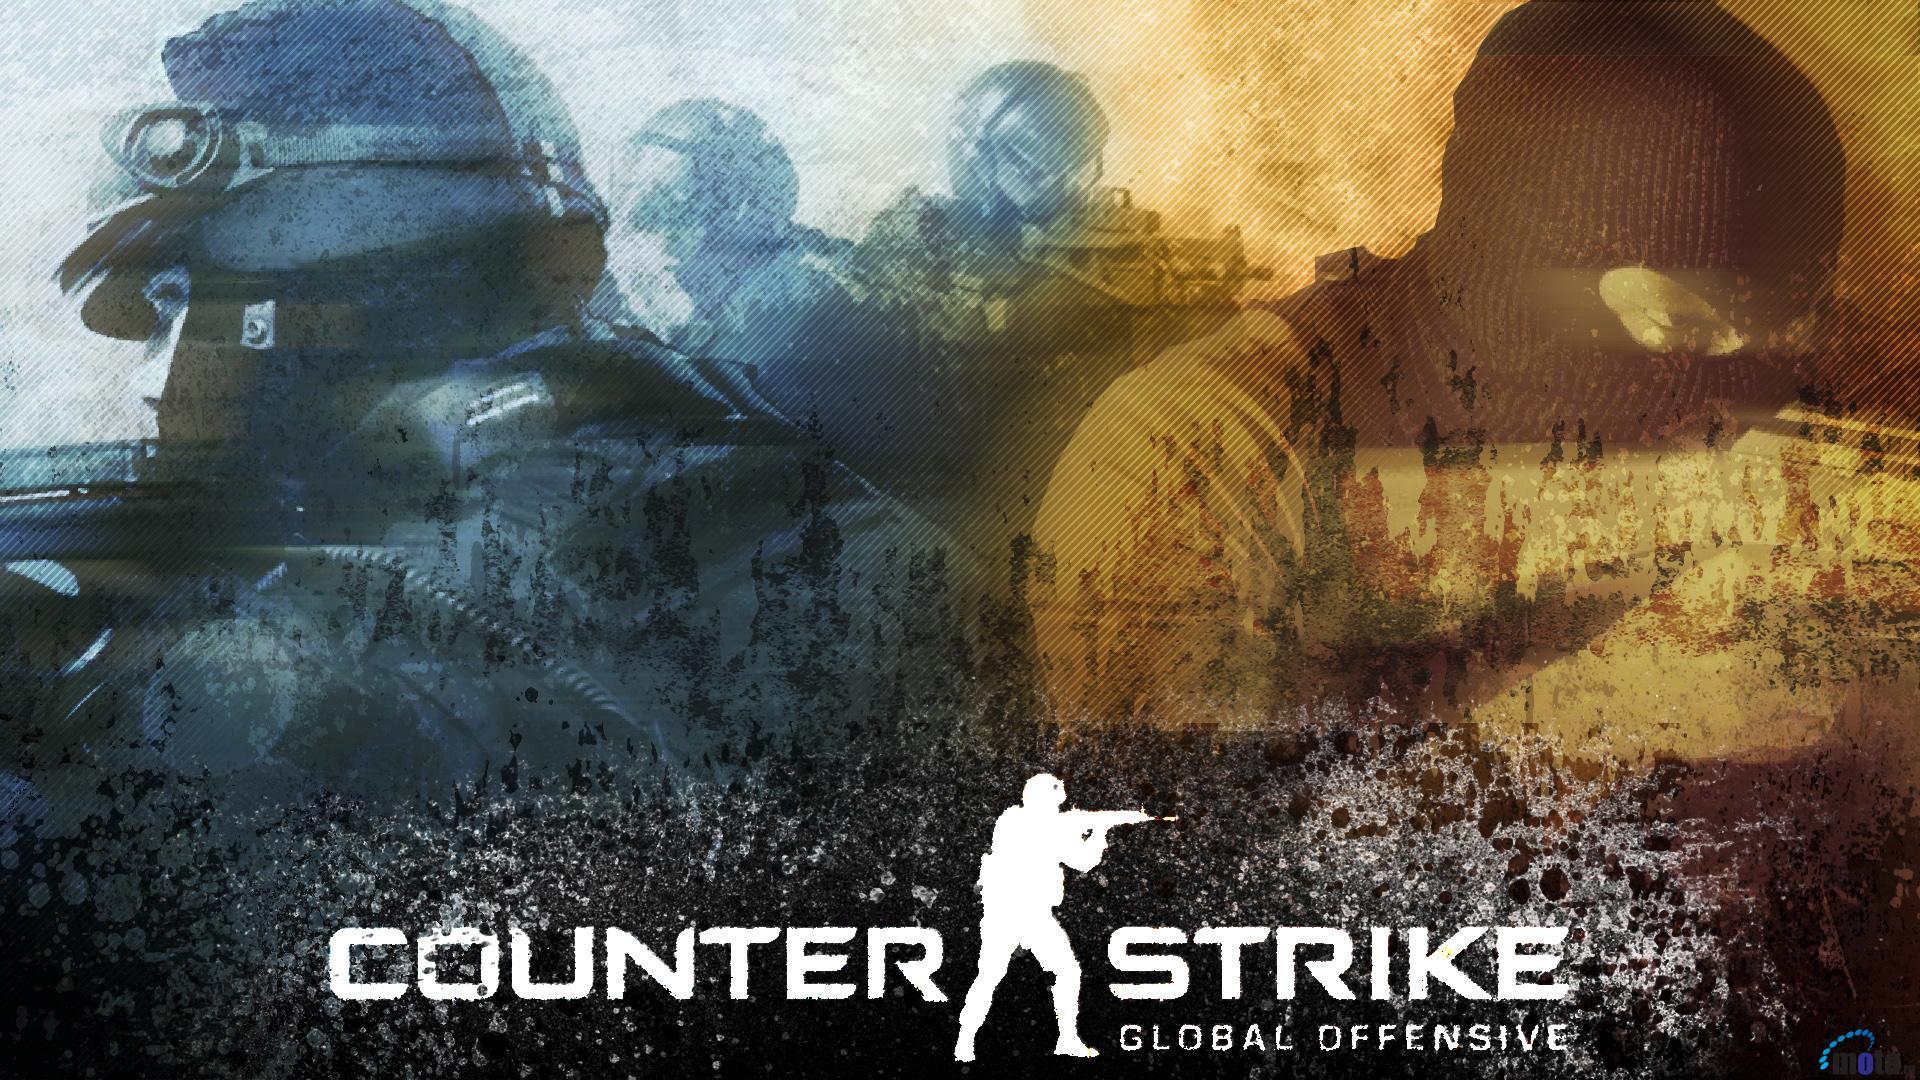 Wallpaper Counter Strike Global Offensive 1920 x 1080 HDTV 1080p 1920x1080